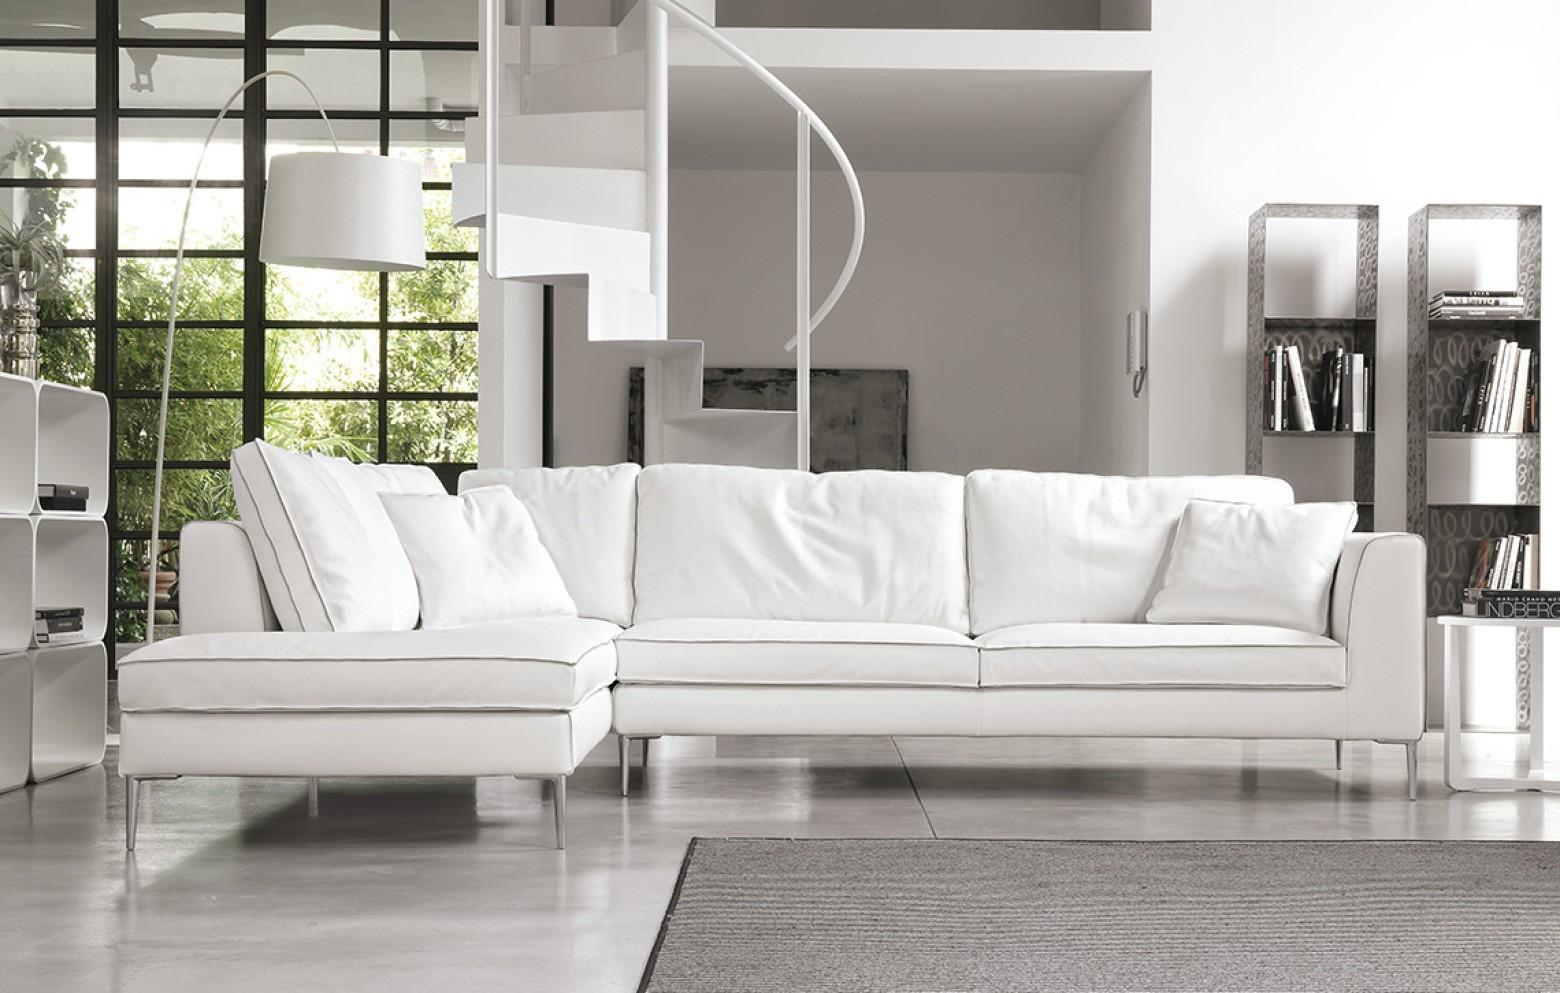 kilt ecksofas polsterm bel who 39 s perfect. Black Bedroom Furniture Sets. Home Design Ideas